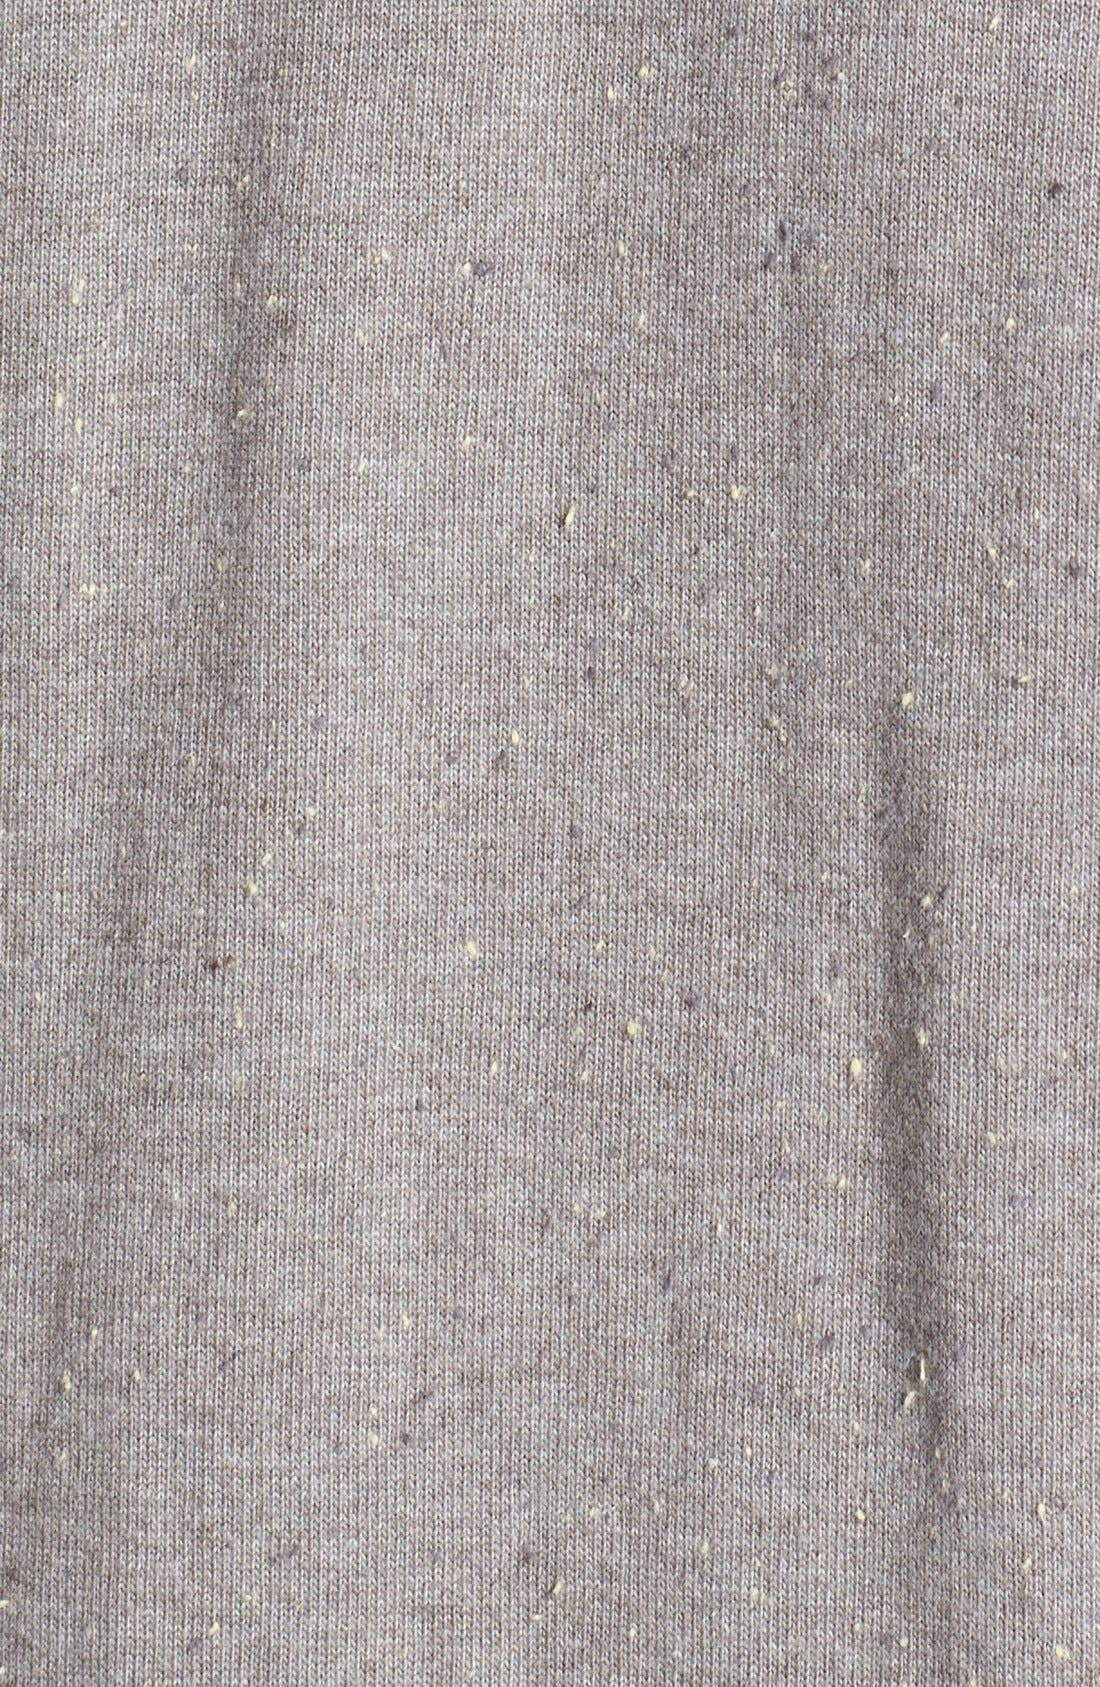 Alternate Image 3  - Tommy Bahama Denim 'Power Nep' Knit Jacket